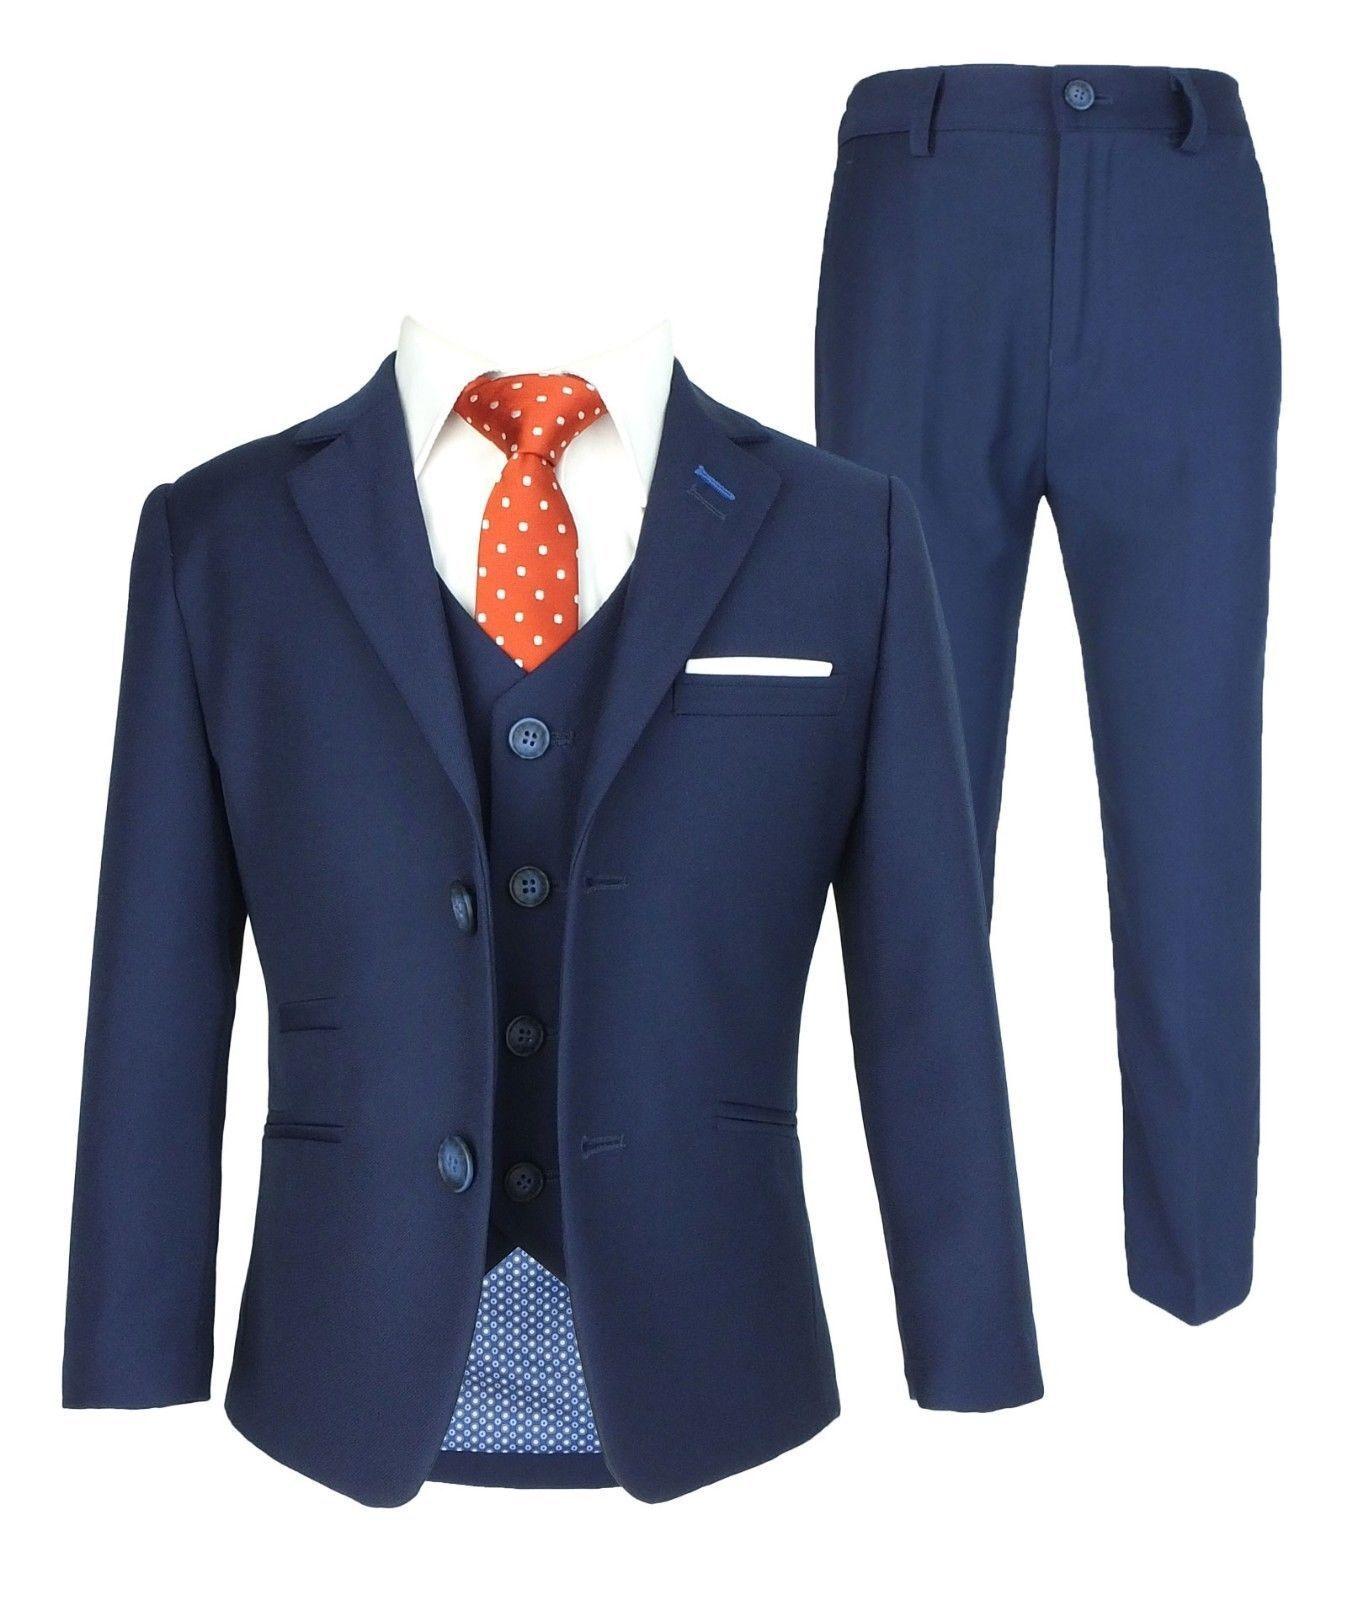 Designer Cavani Slim Fit Kinder Jungen Anzug, Marineblau, 3 oder 5 Teilig